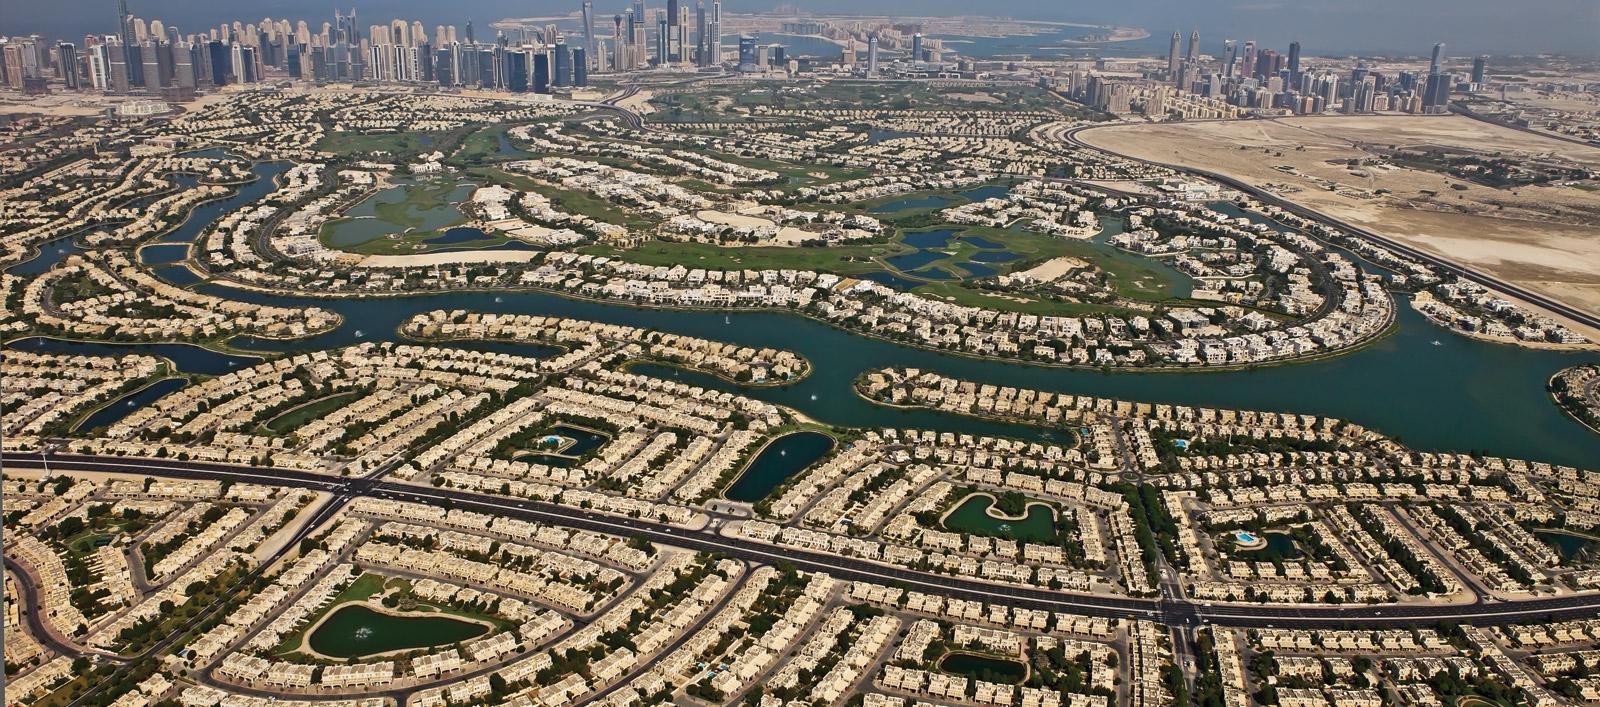 The Springs Community in Dubai